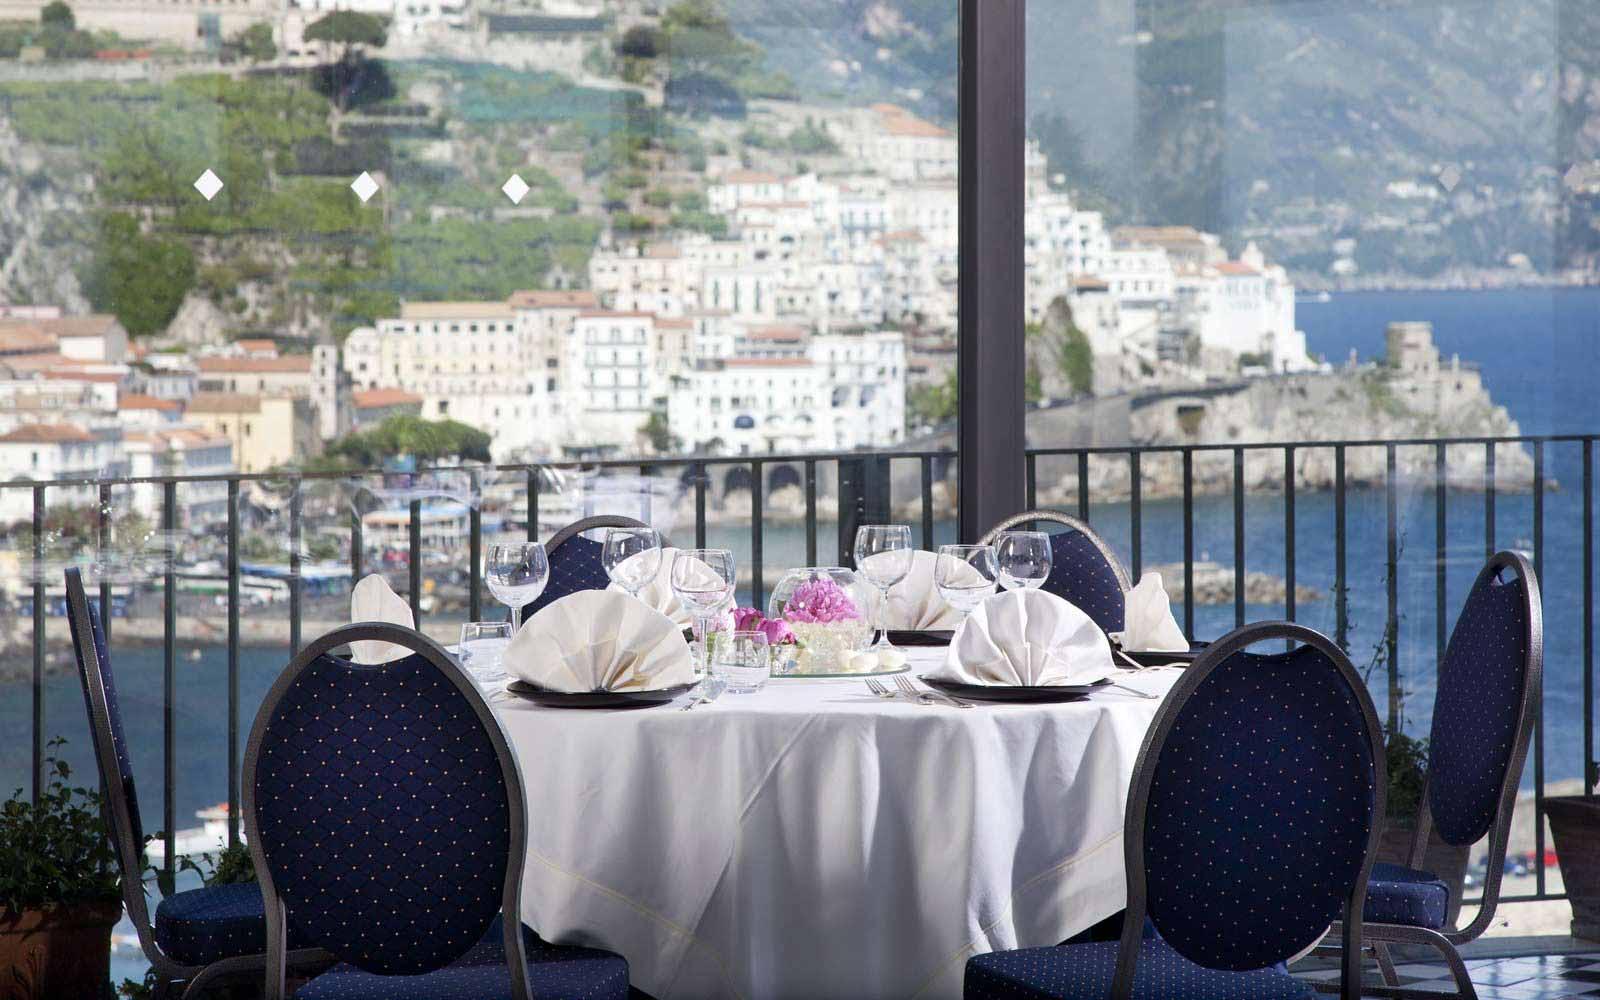 Il Miramalfi restaurant at Hotel Miramalfi